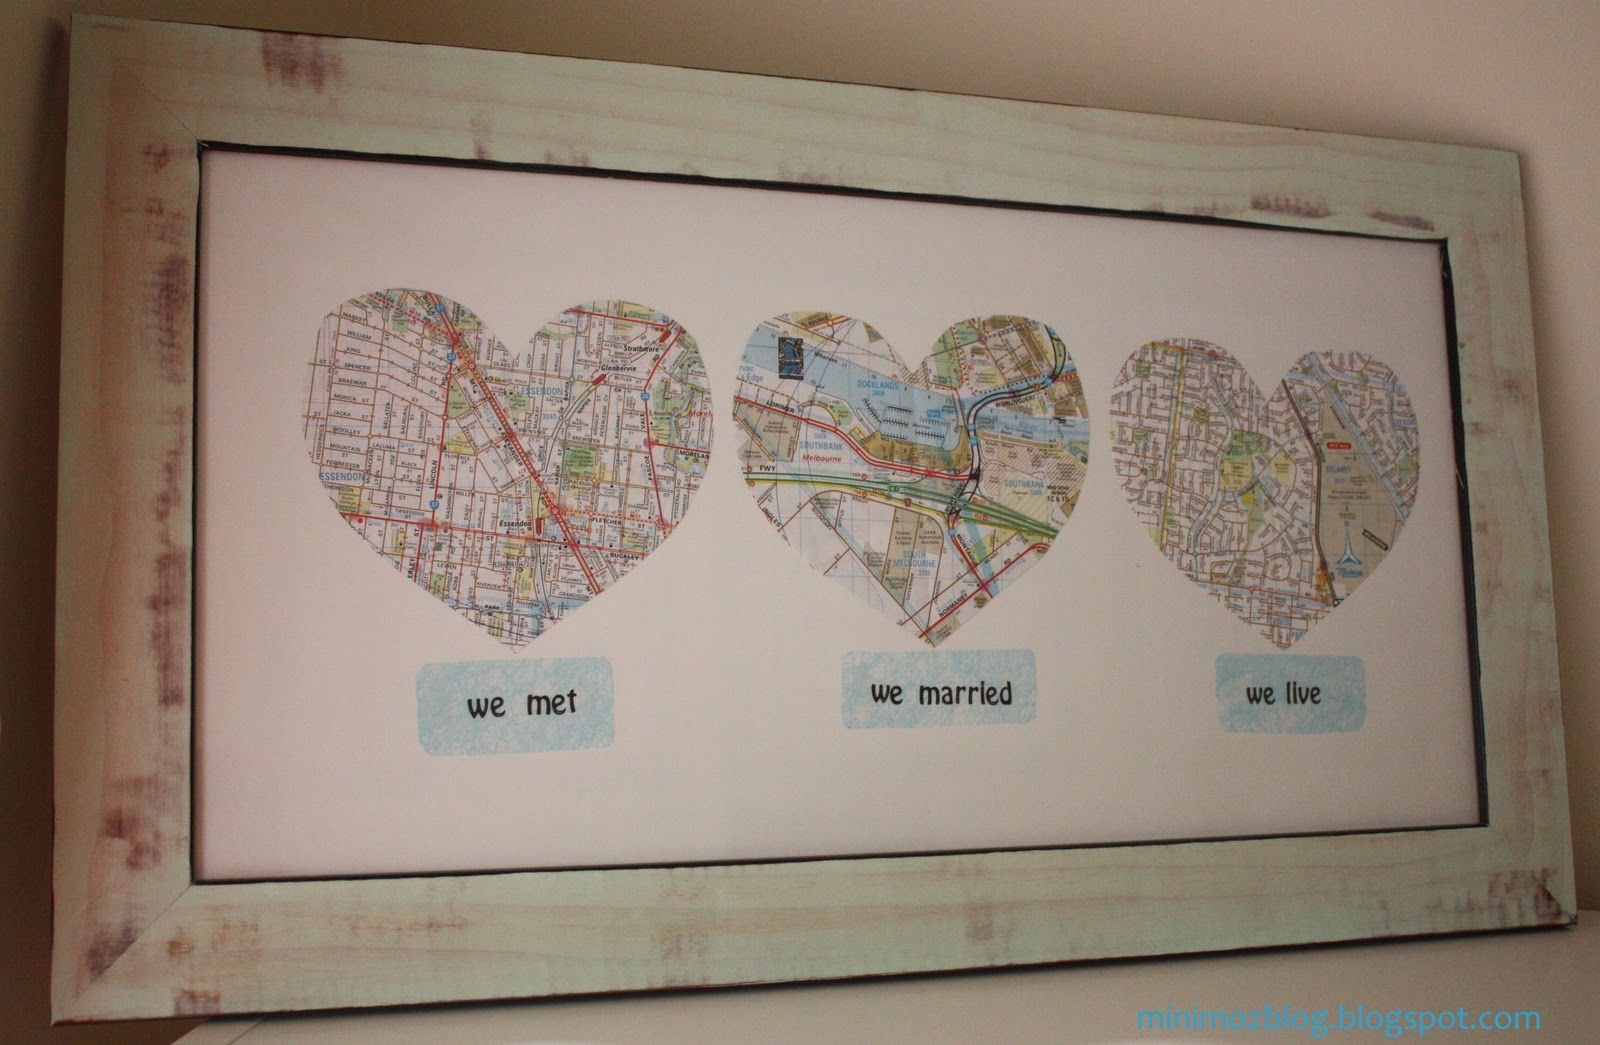 DIY framed heart-shaped maps - where we met, we married, we live